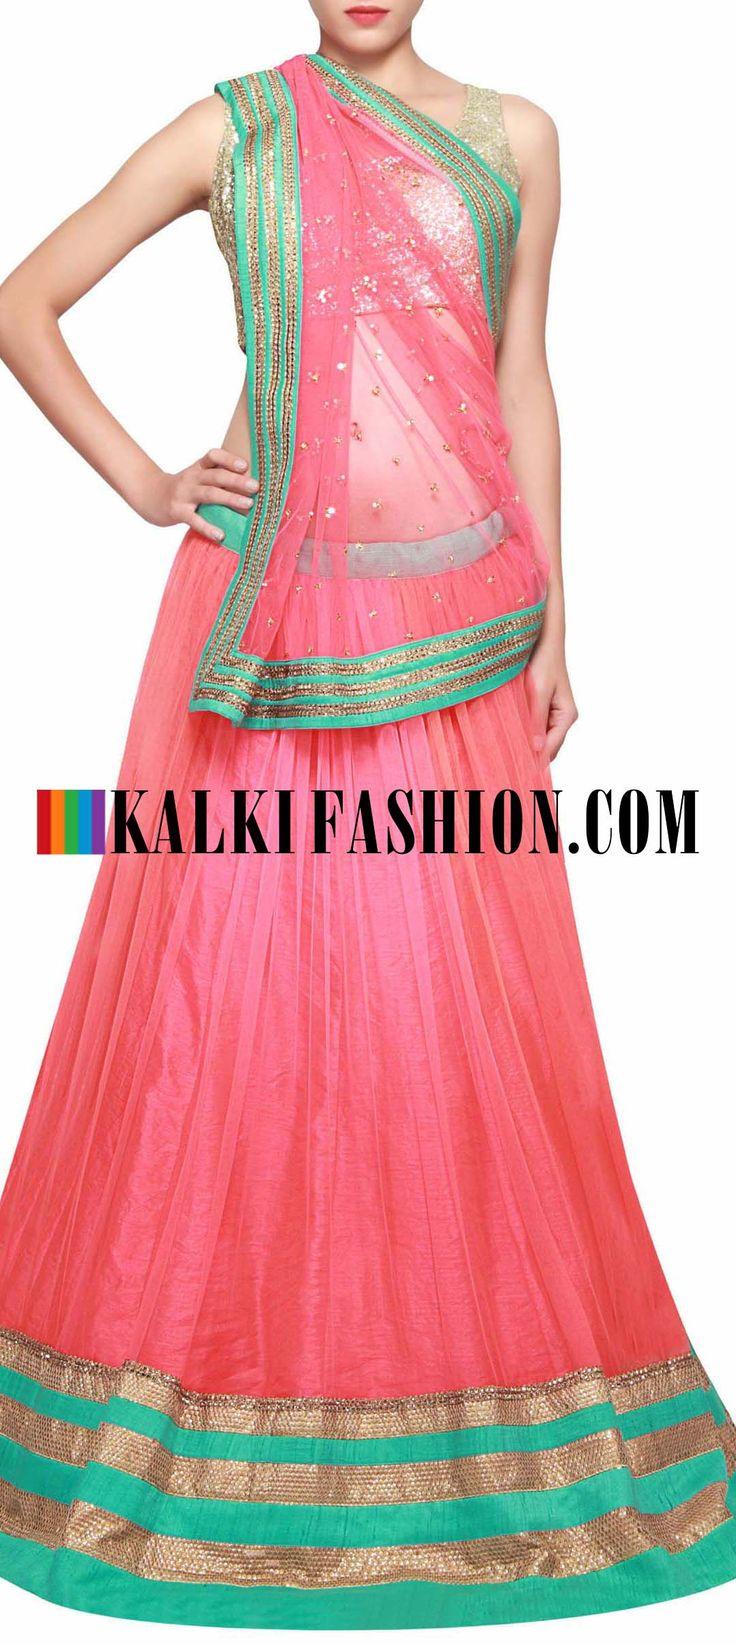 Get this beautiful lehenga here: http://www.kalkifashion.com/peach-lehenga-embellished-in-kardana-embroidery-only-on-kalki.html Free shipping worldwide.